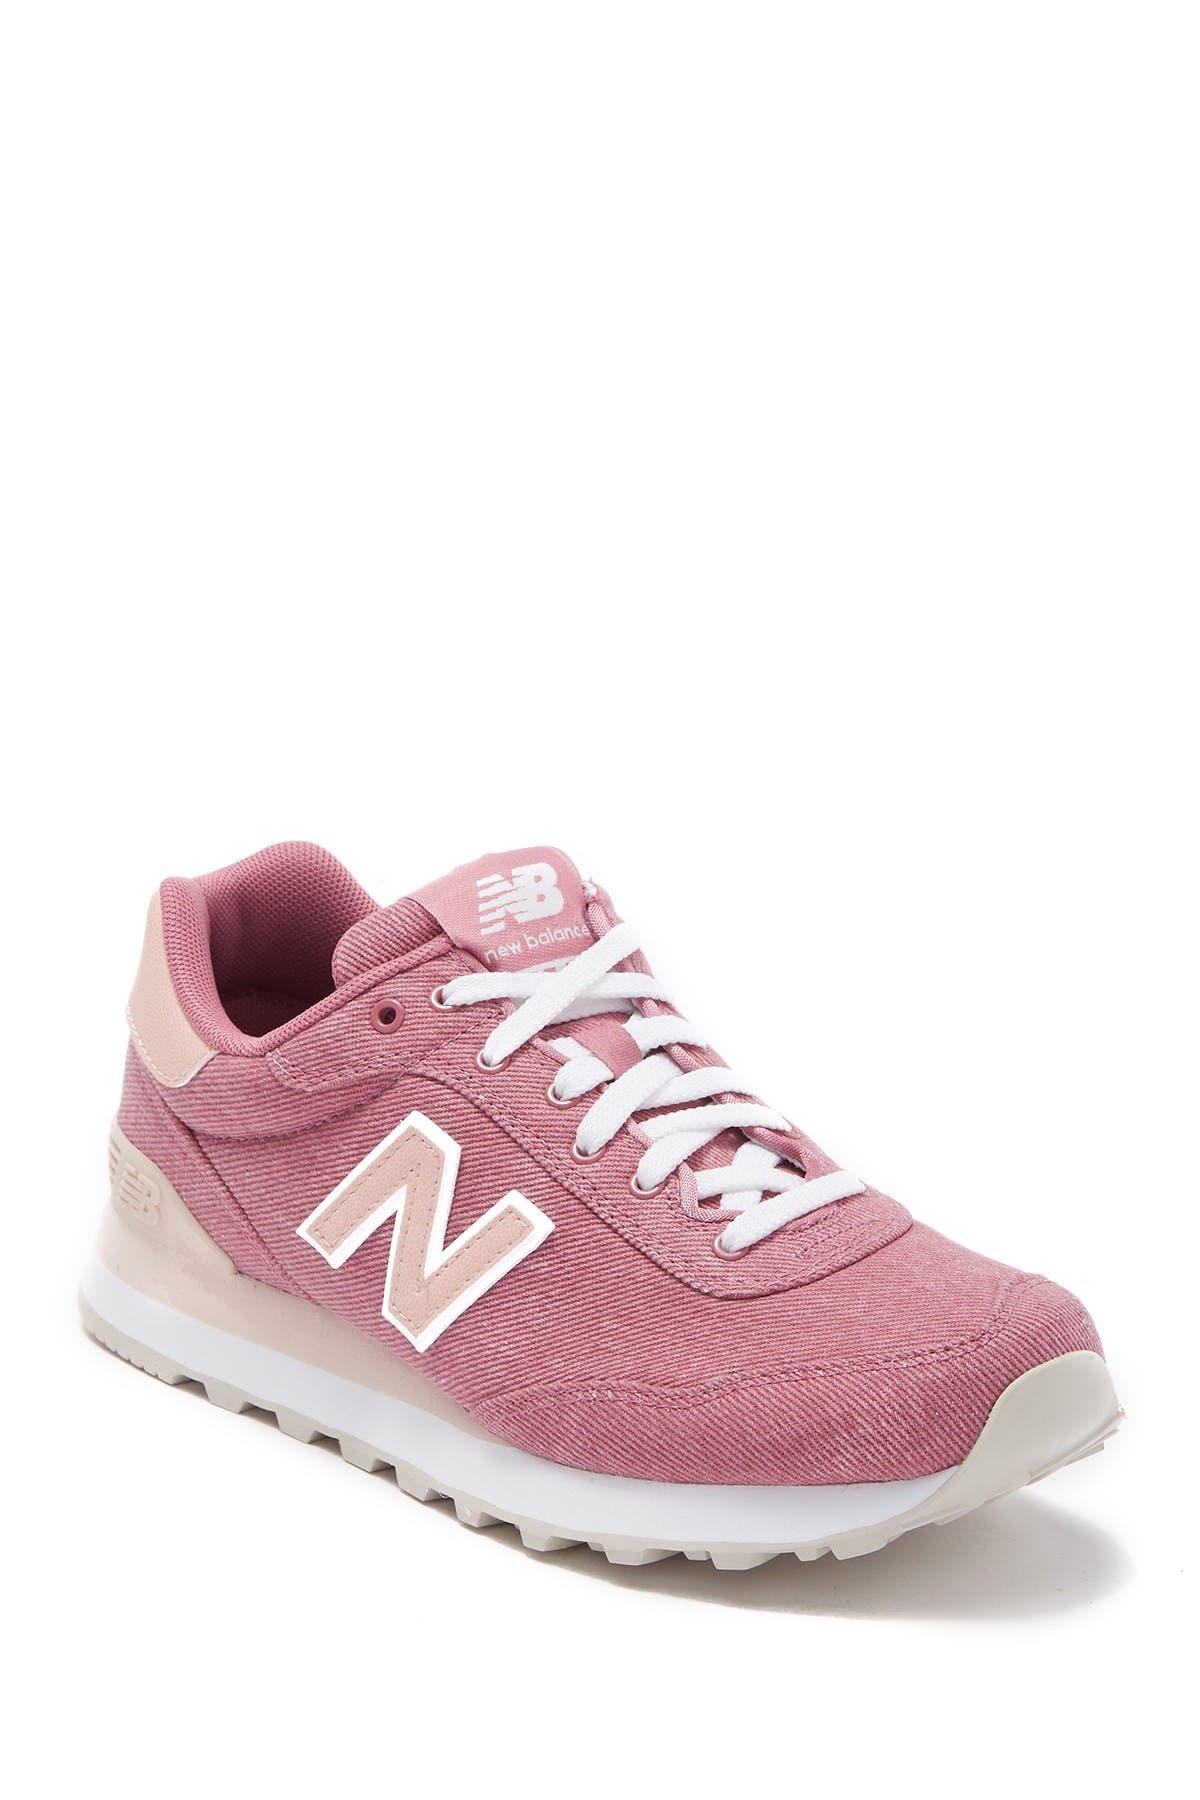 New Balance | 515 Lifestyle Sneaker